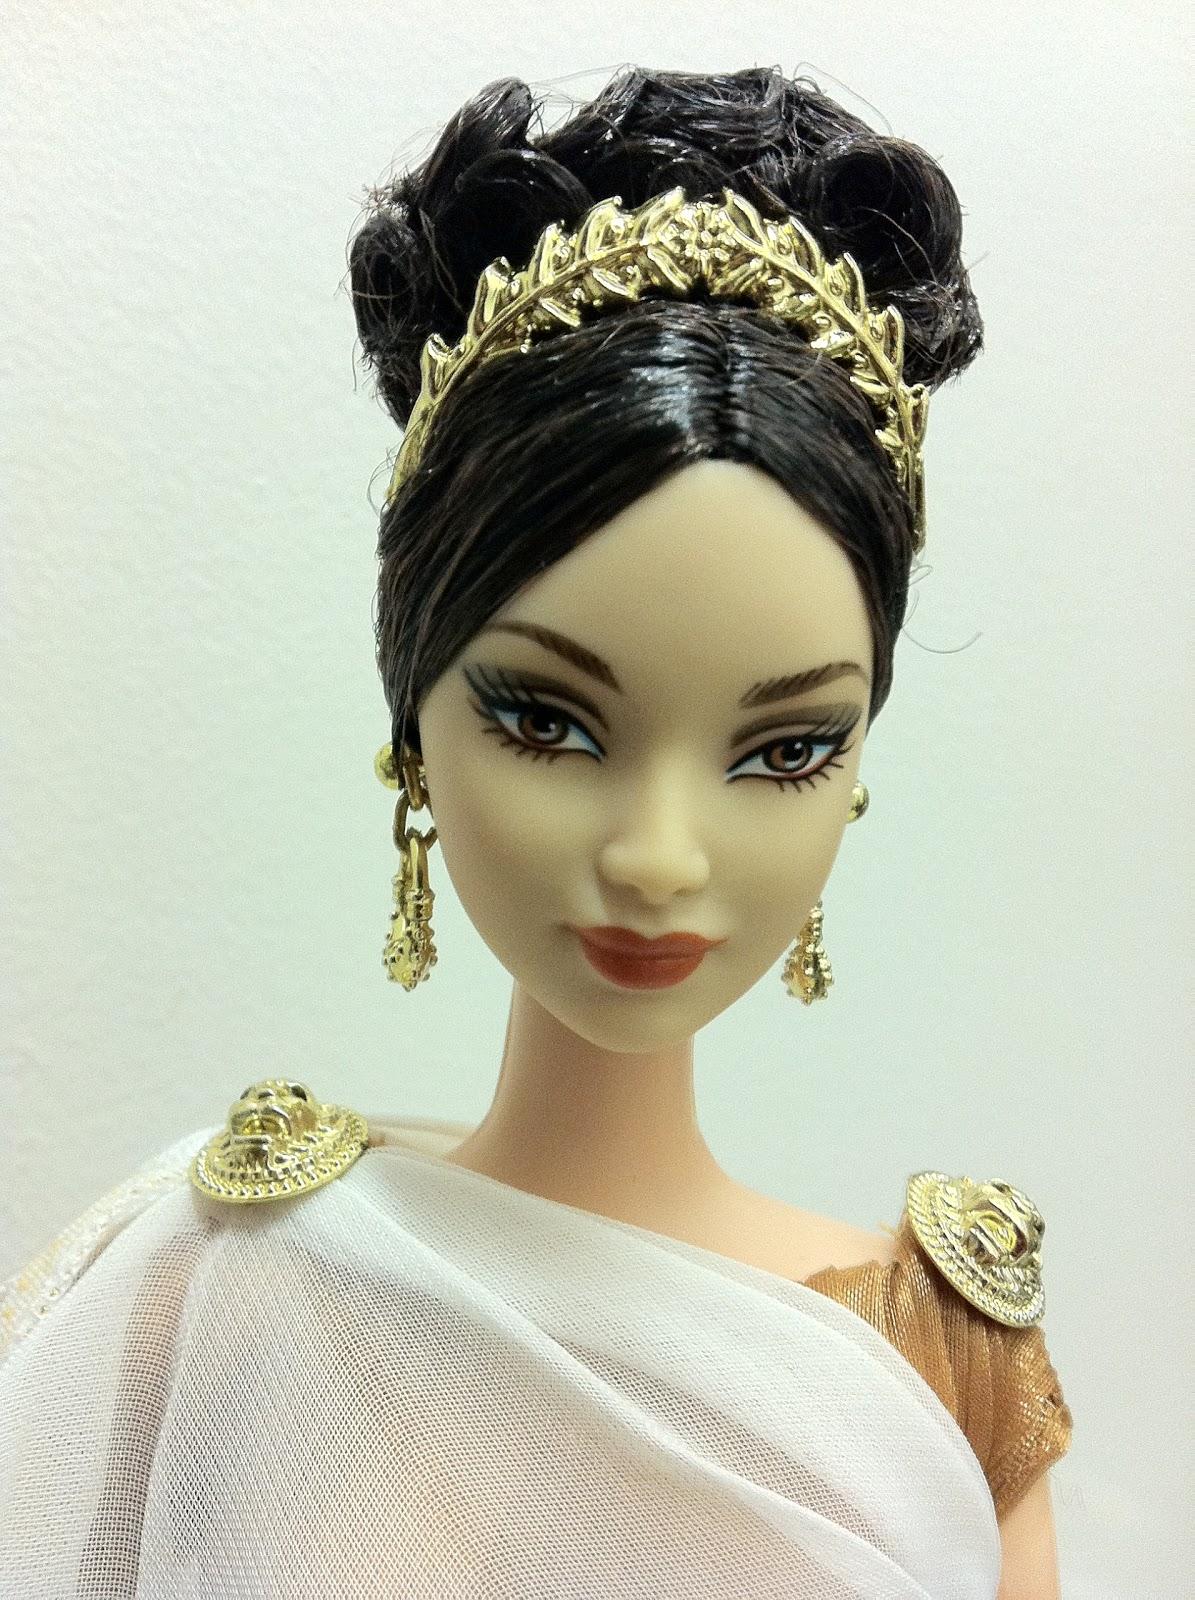 Barbie De Boxed Princess Of Ancient Greece